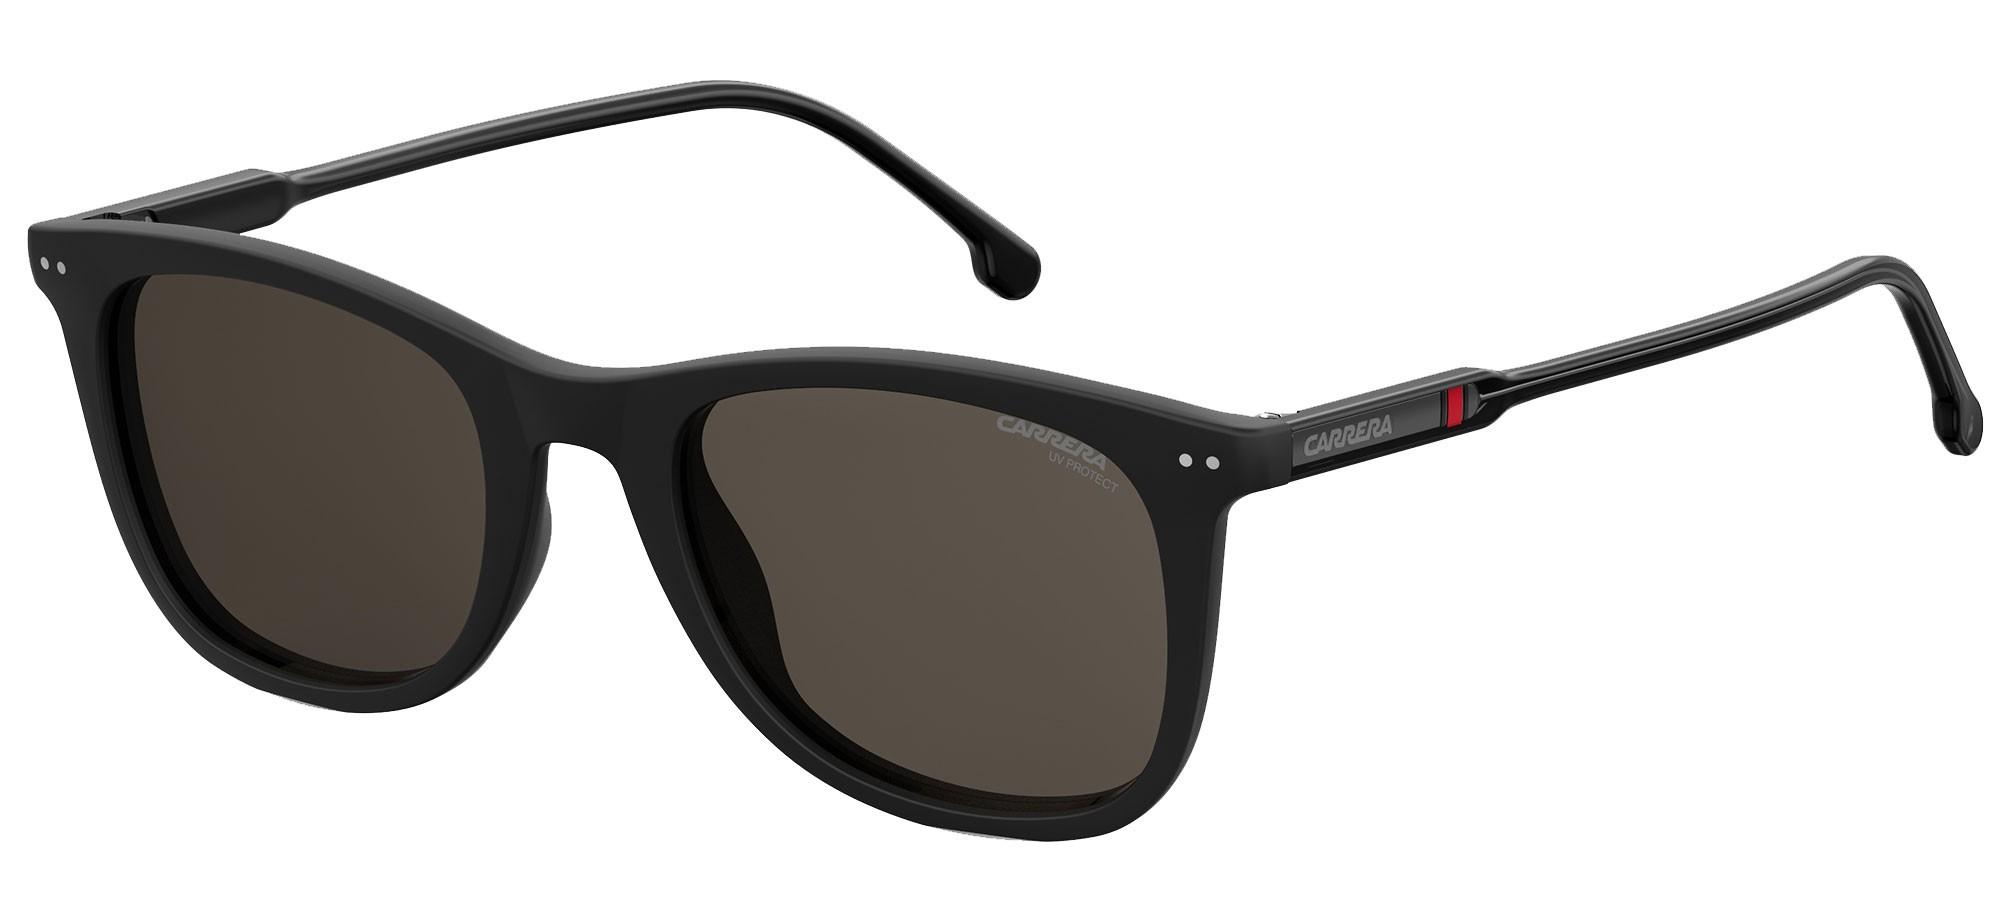 Carrera sunglasses CARRERA 197/S